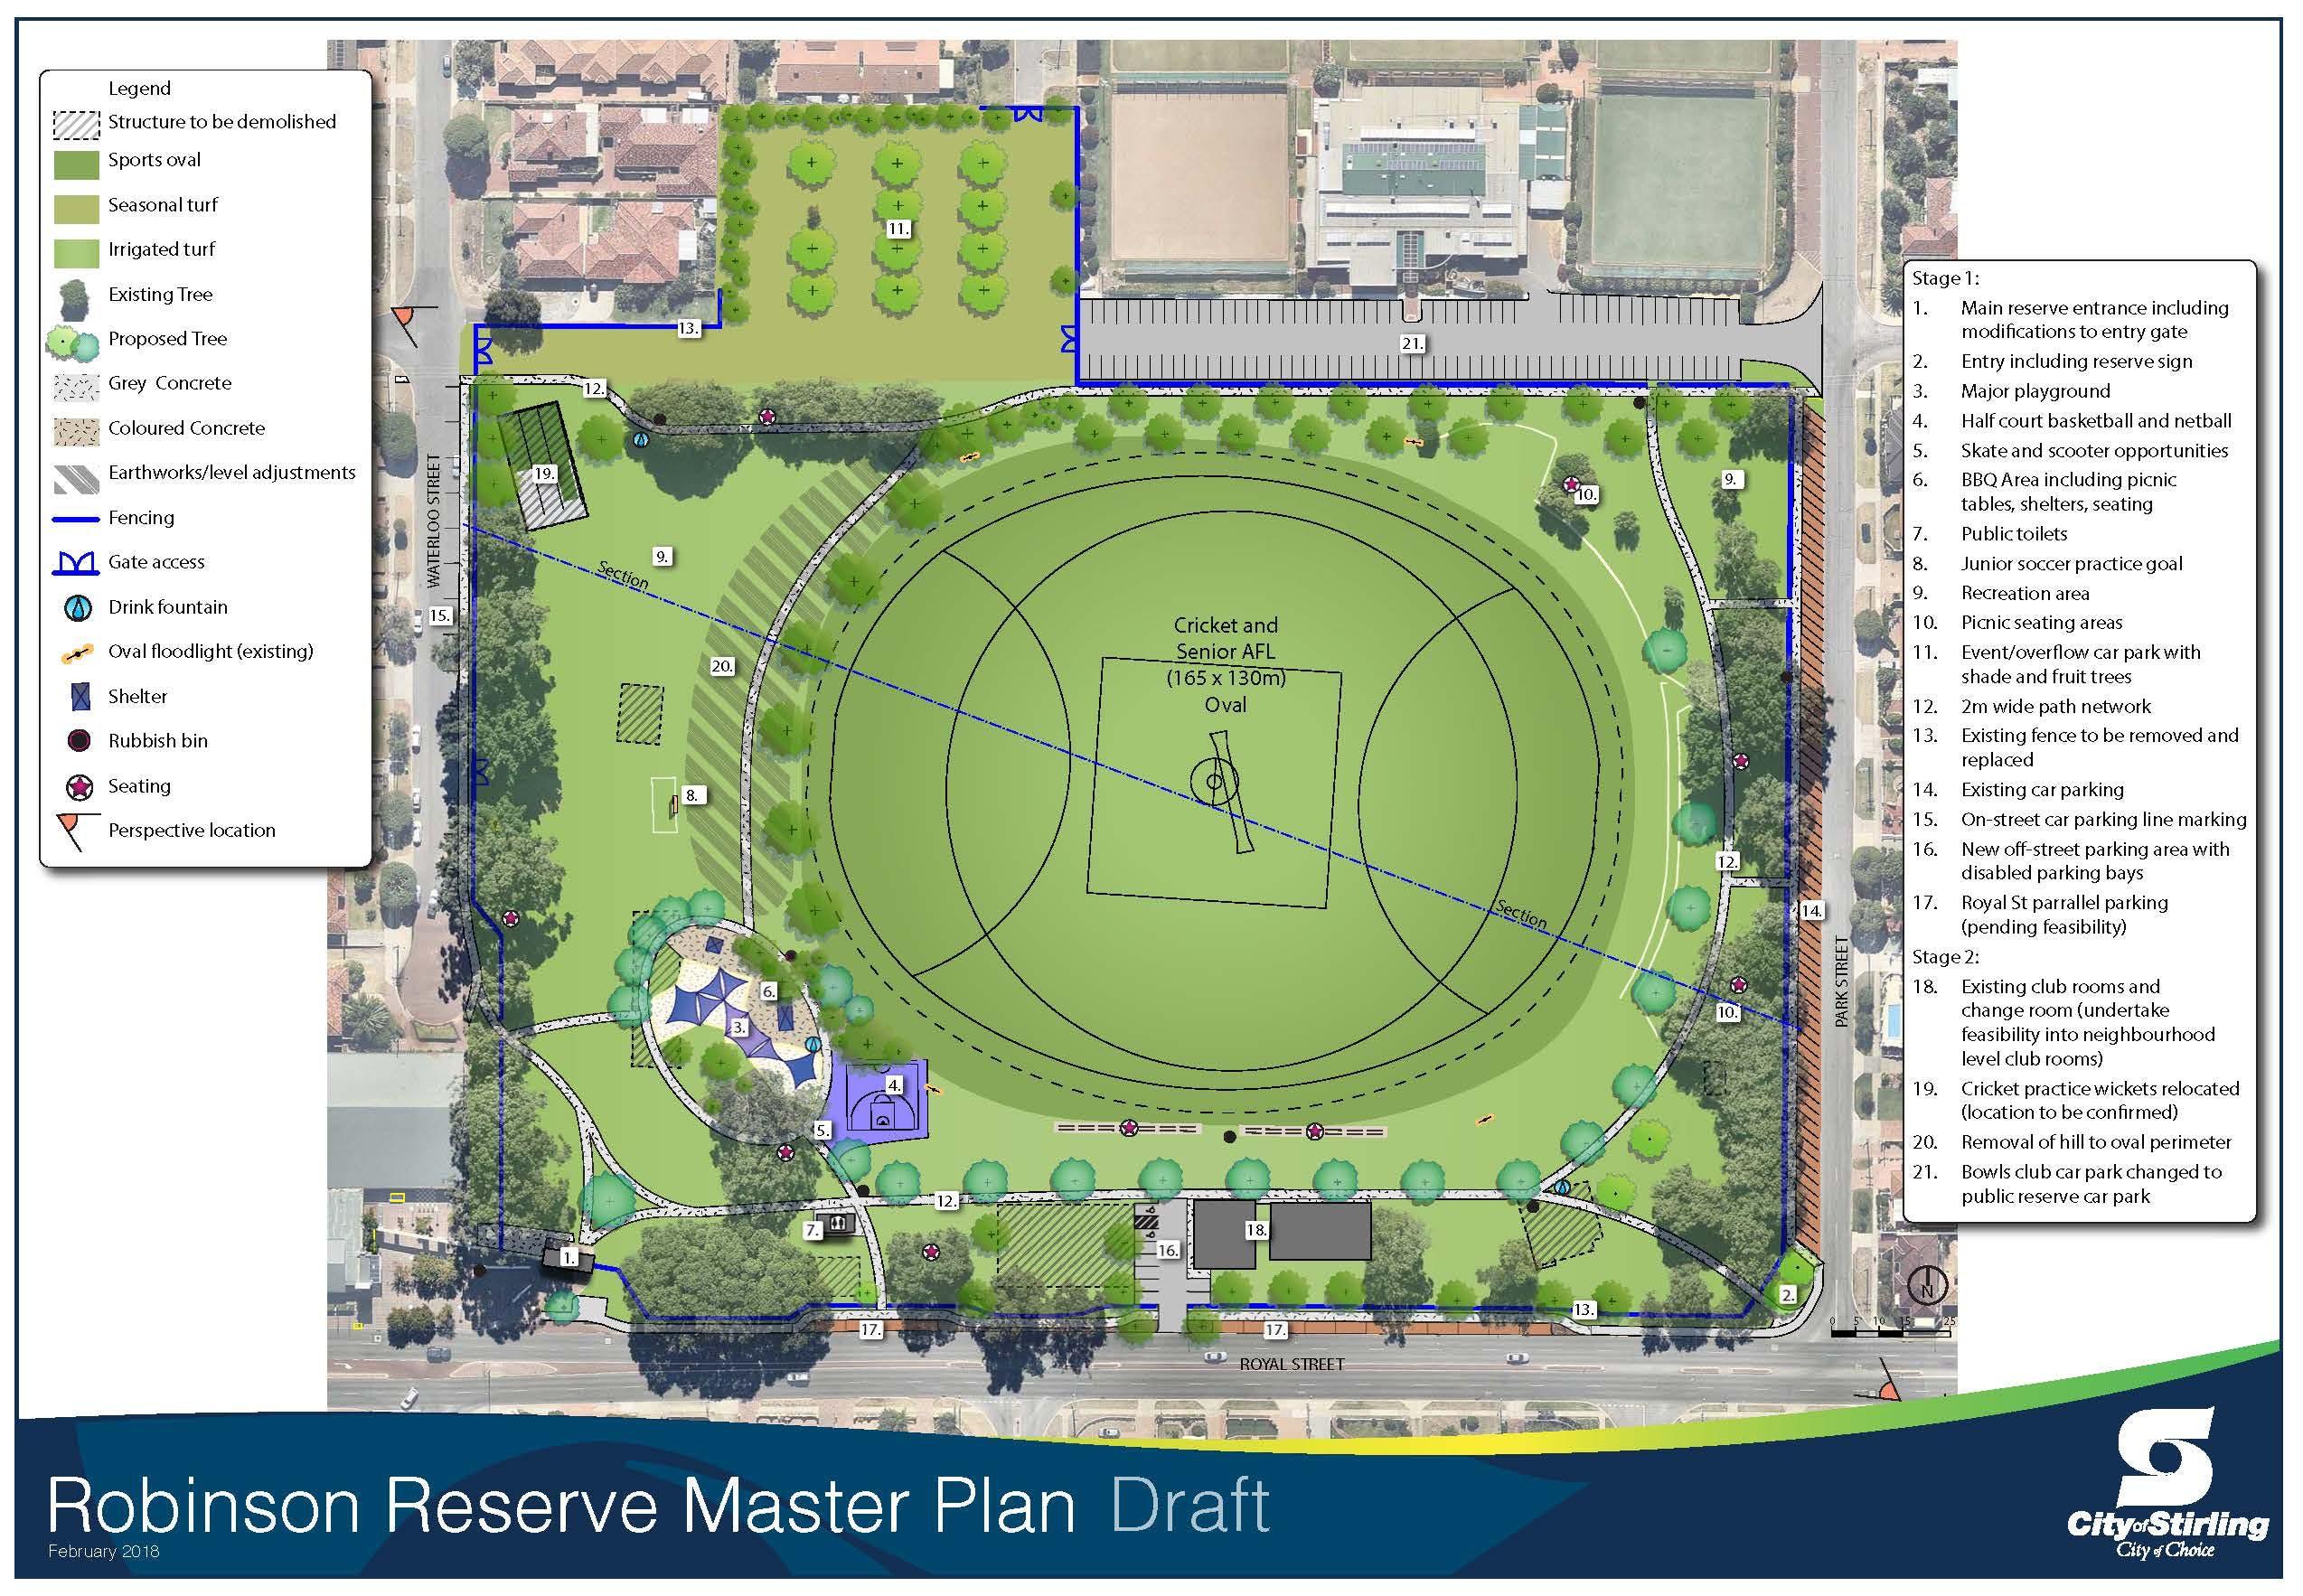 Robinson Reserve Master Plan